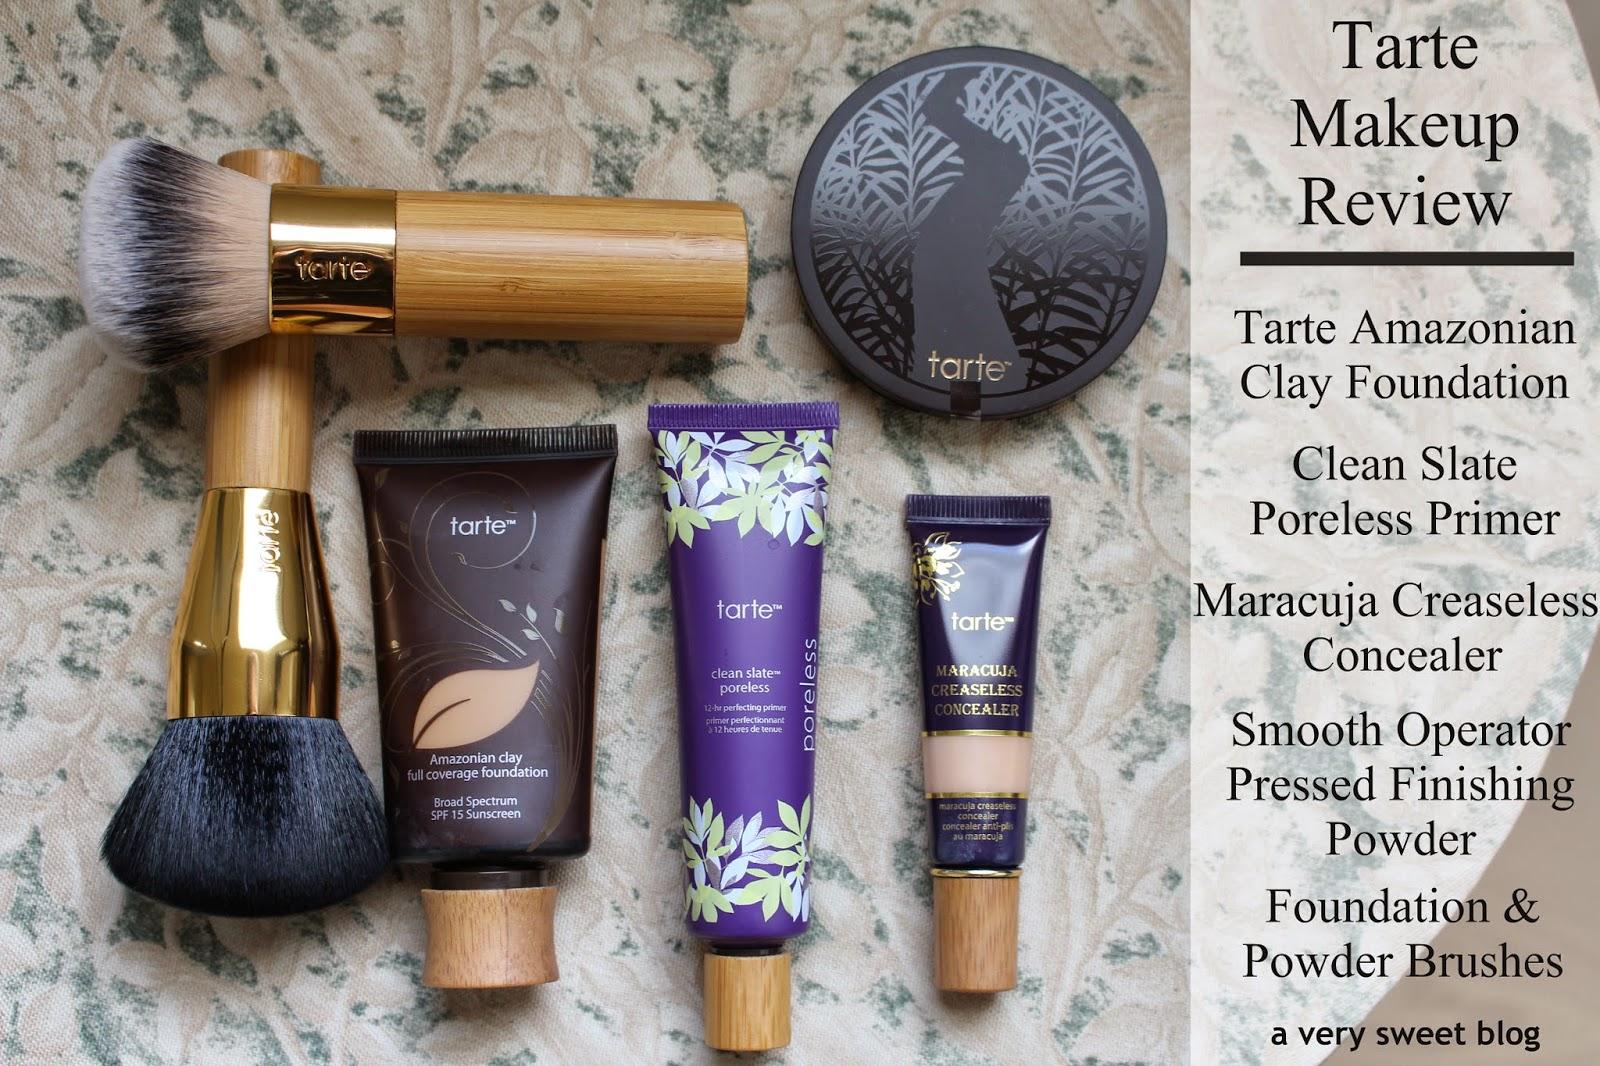 Tarte Makeup Kits | eBay